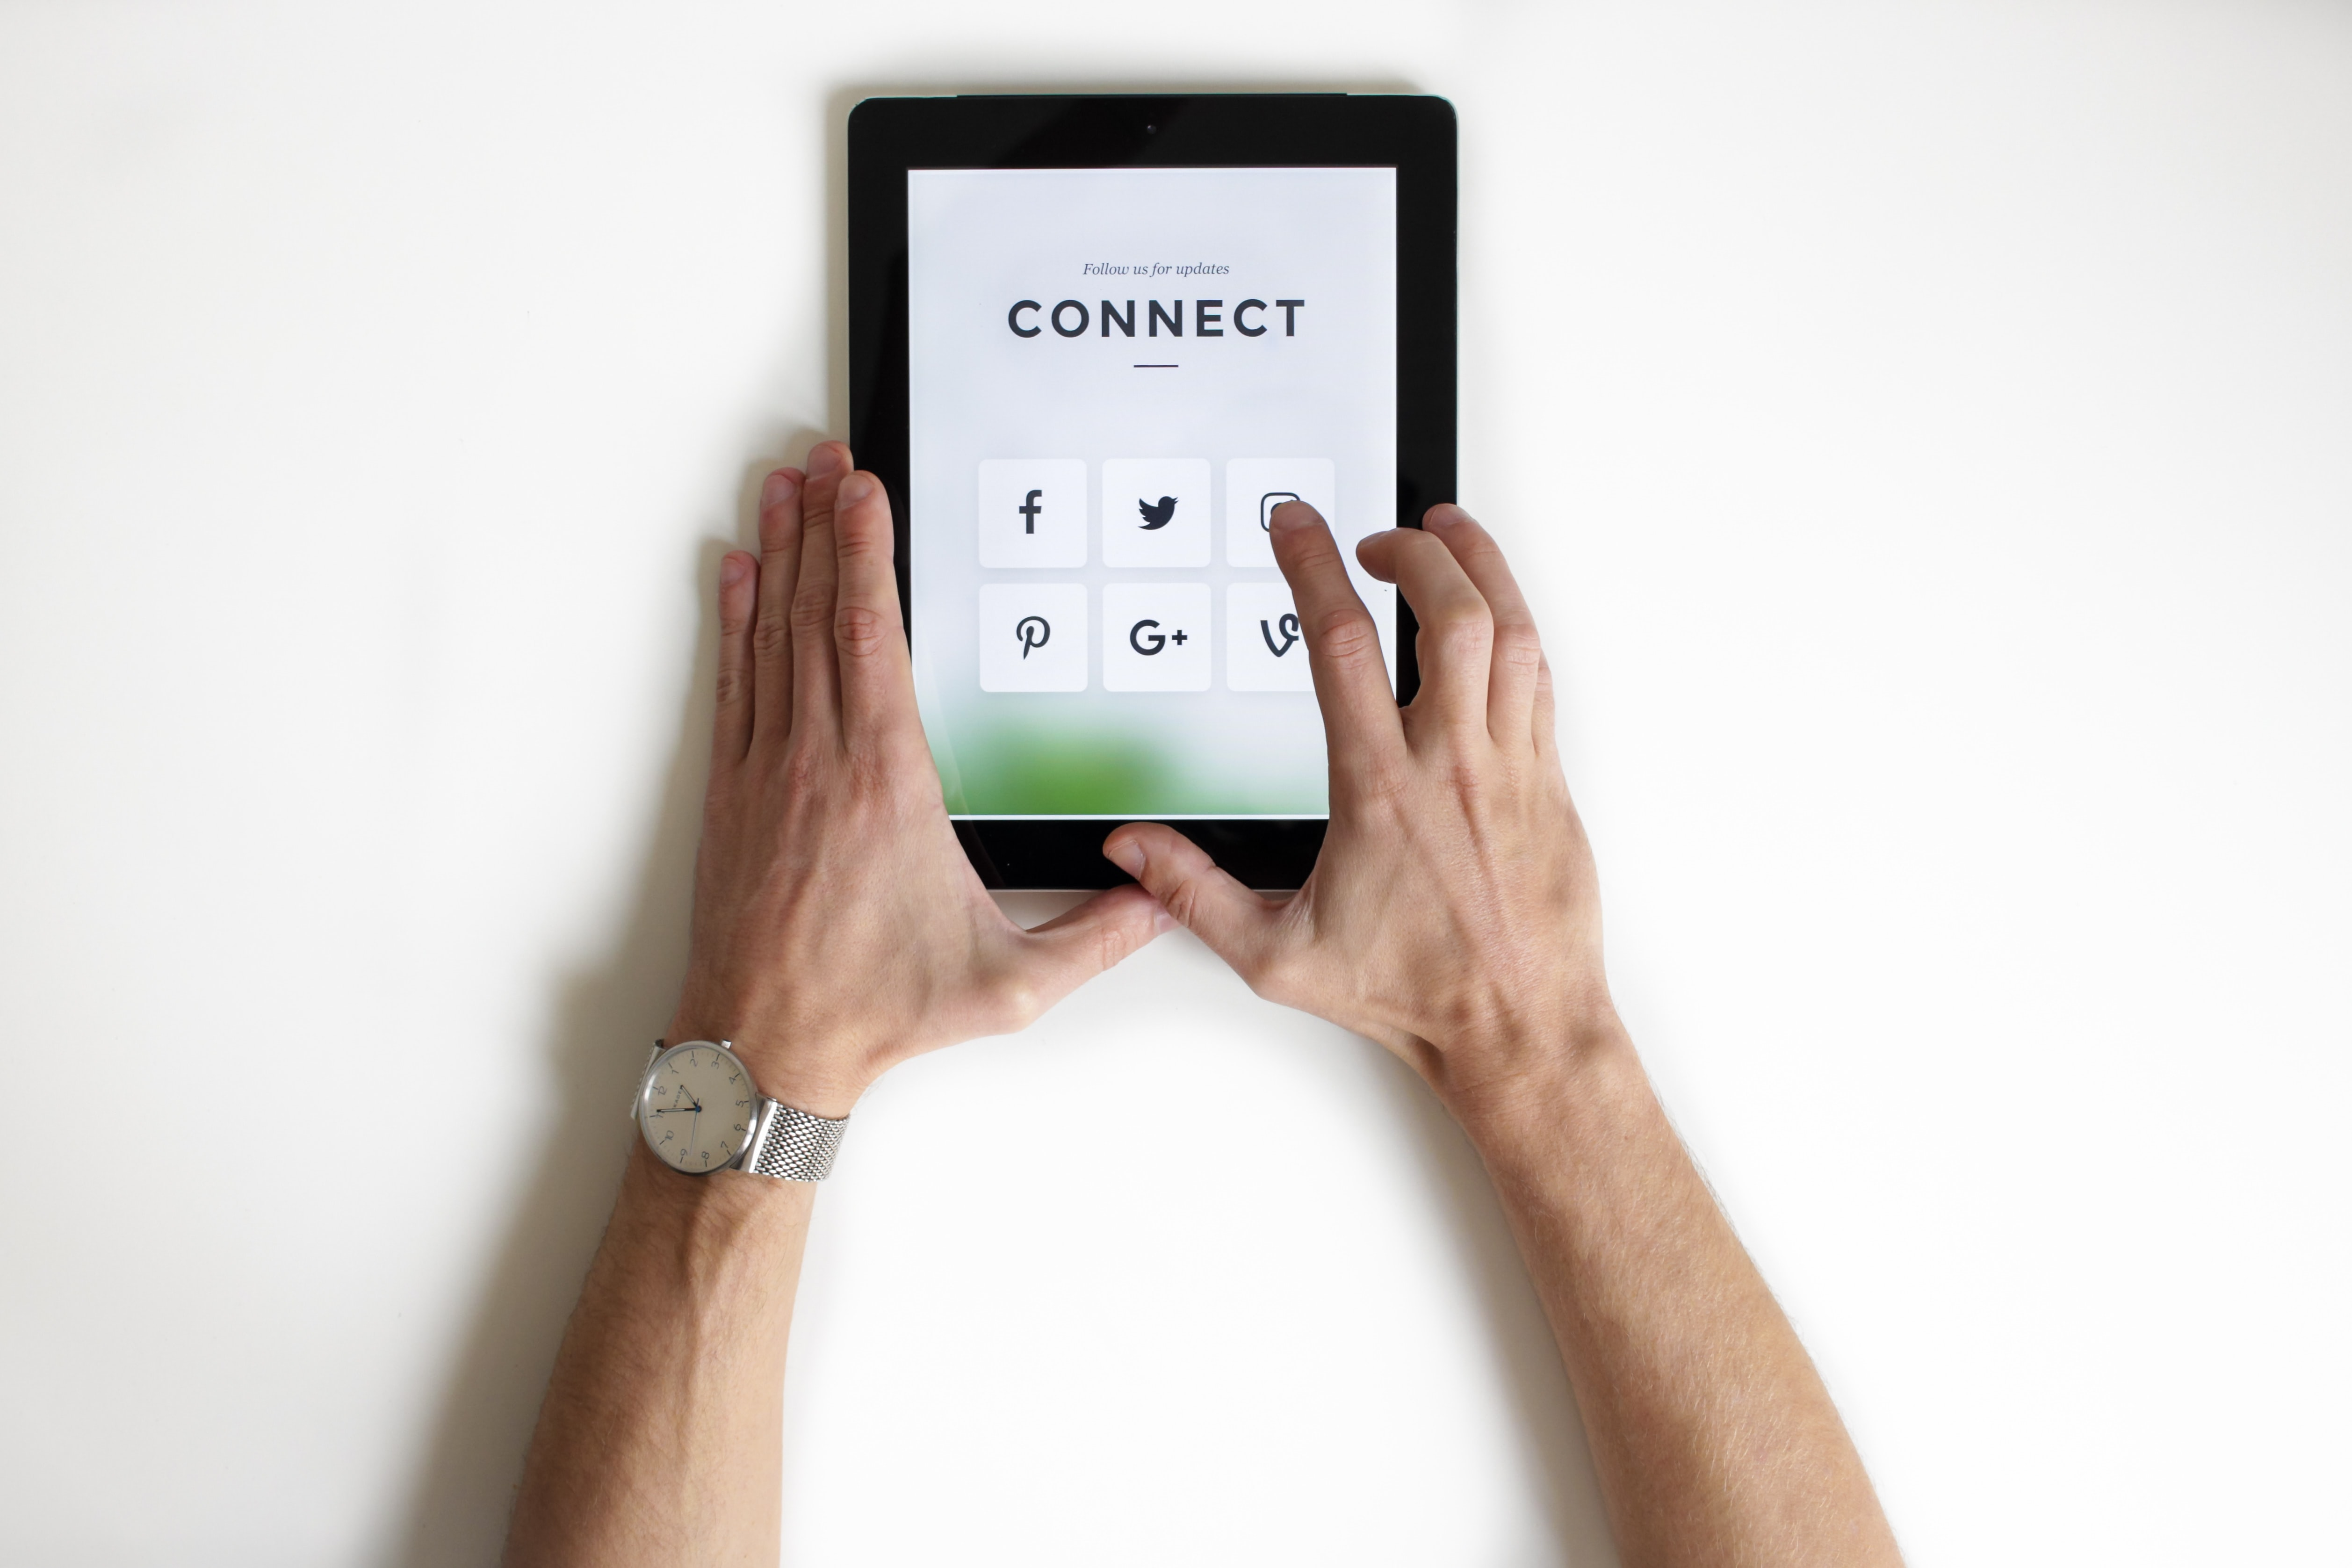 social-media-reputation-blog-image